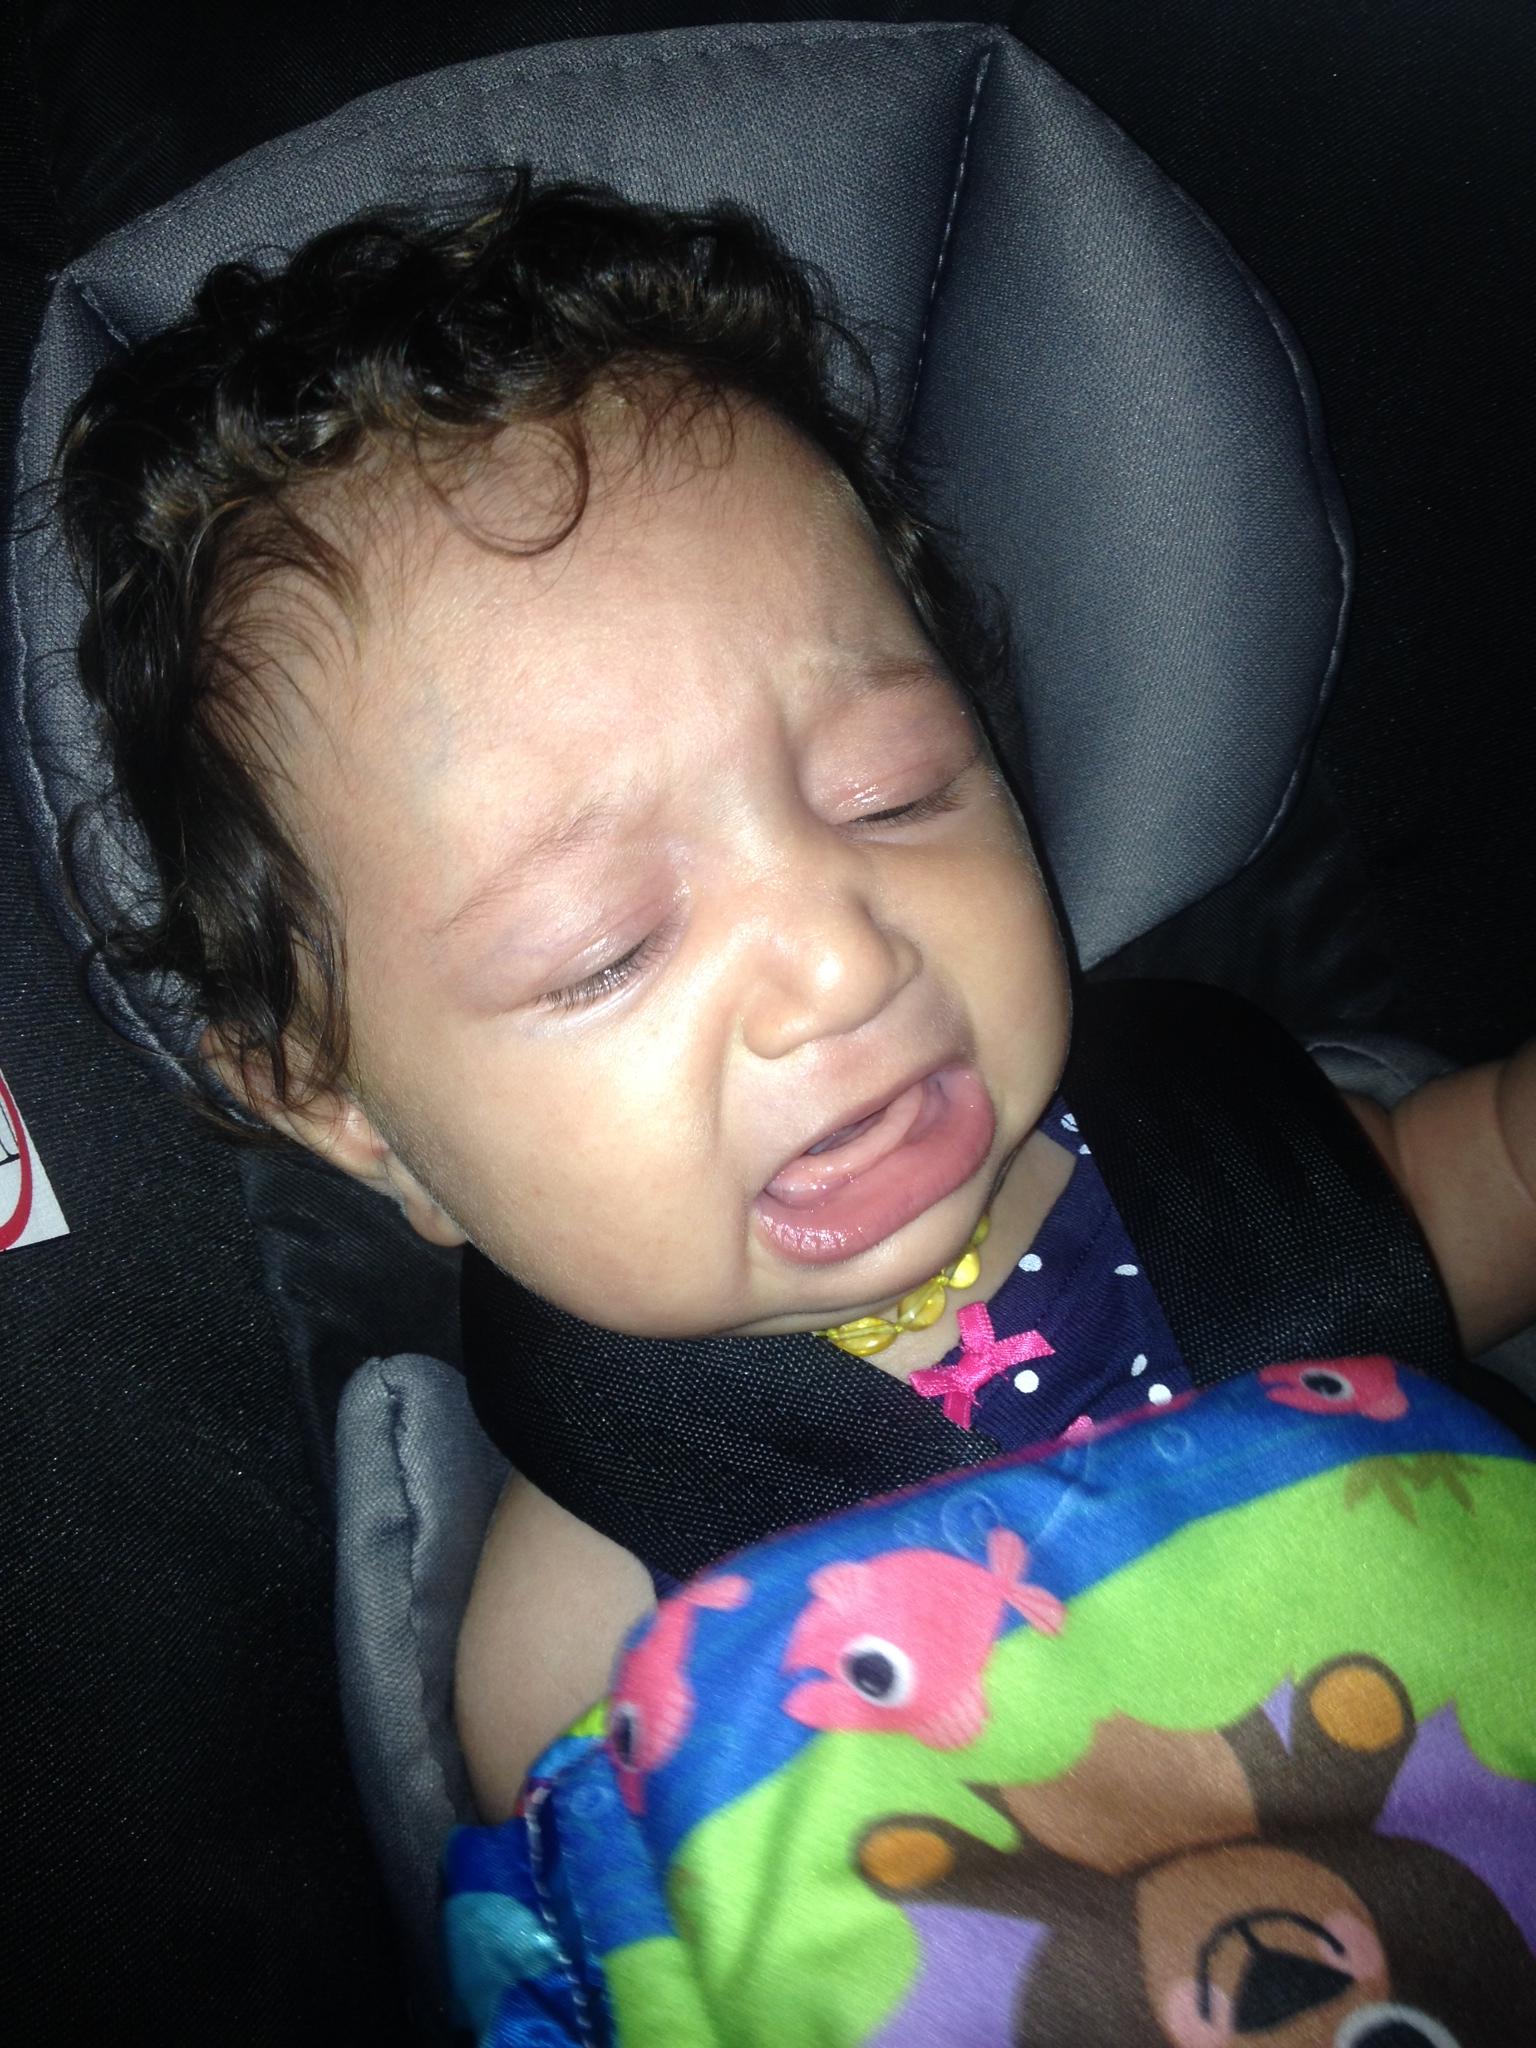 adrionna crying.jpg